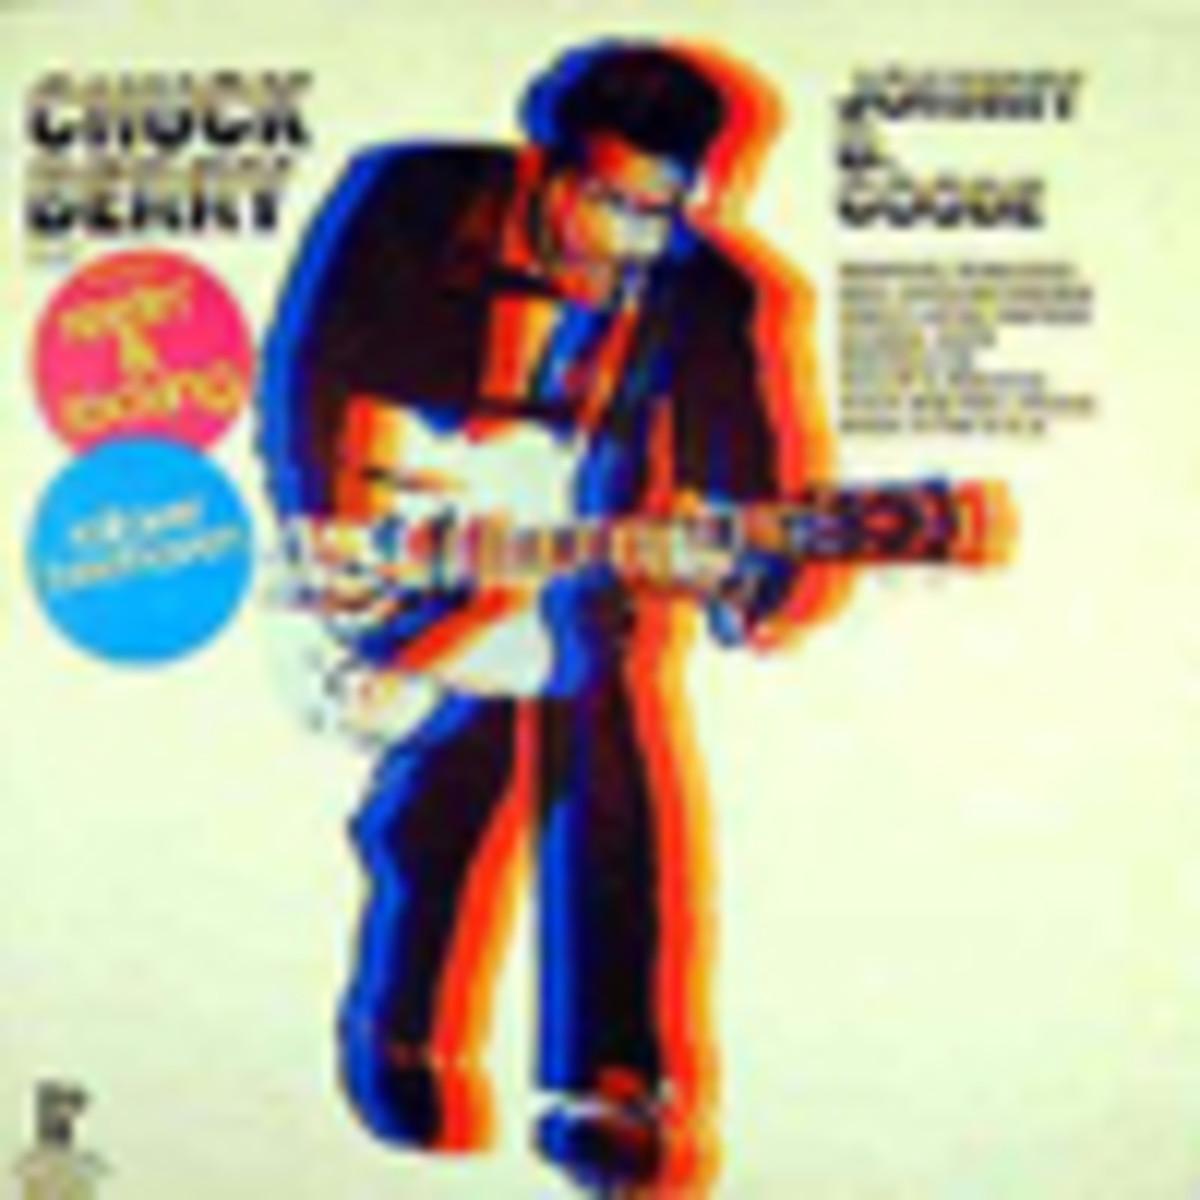 Chuck Berry Johnny B. Goode album